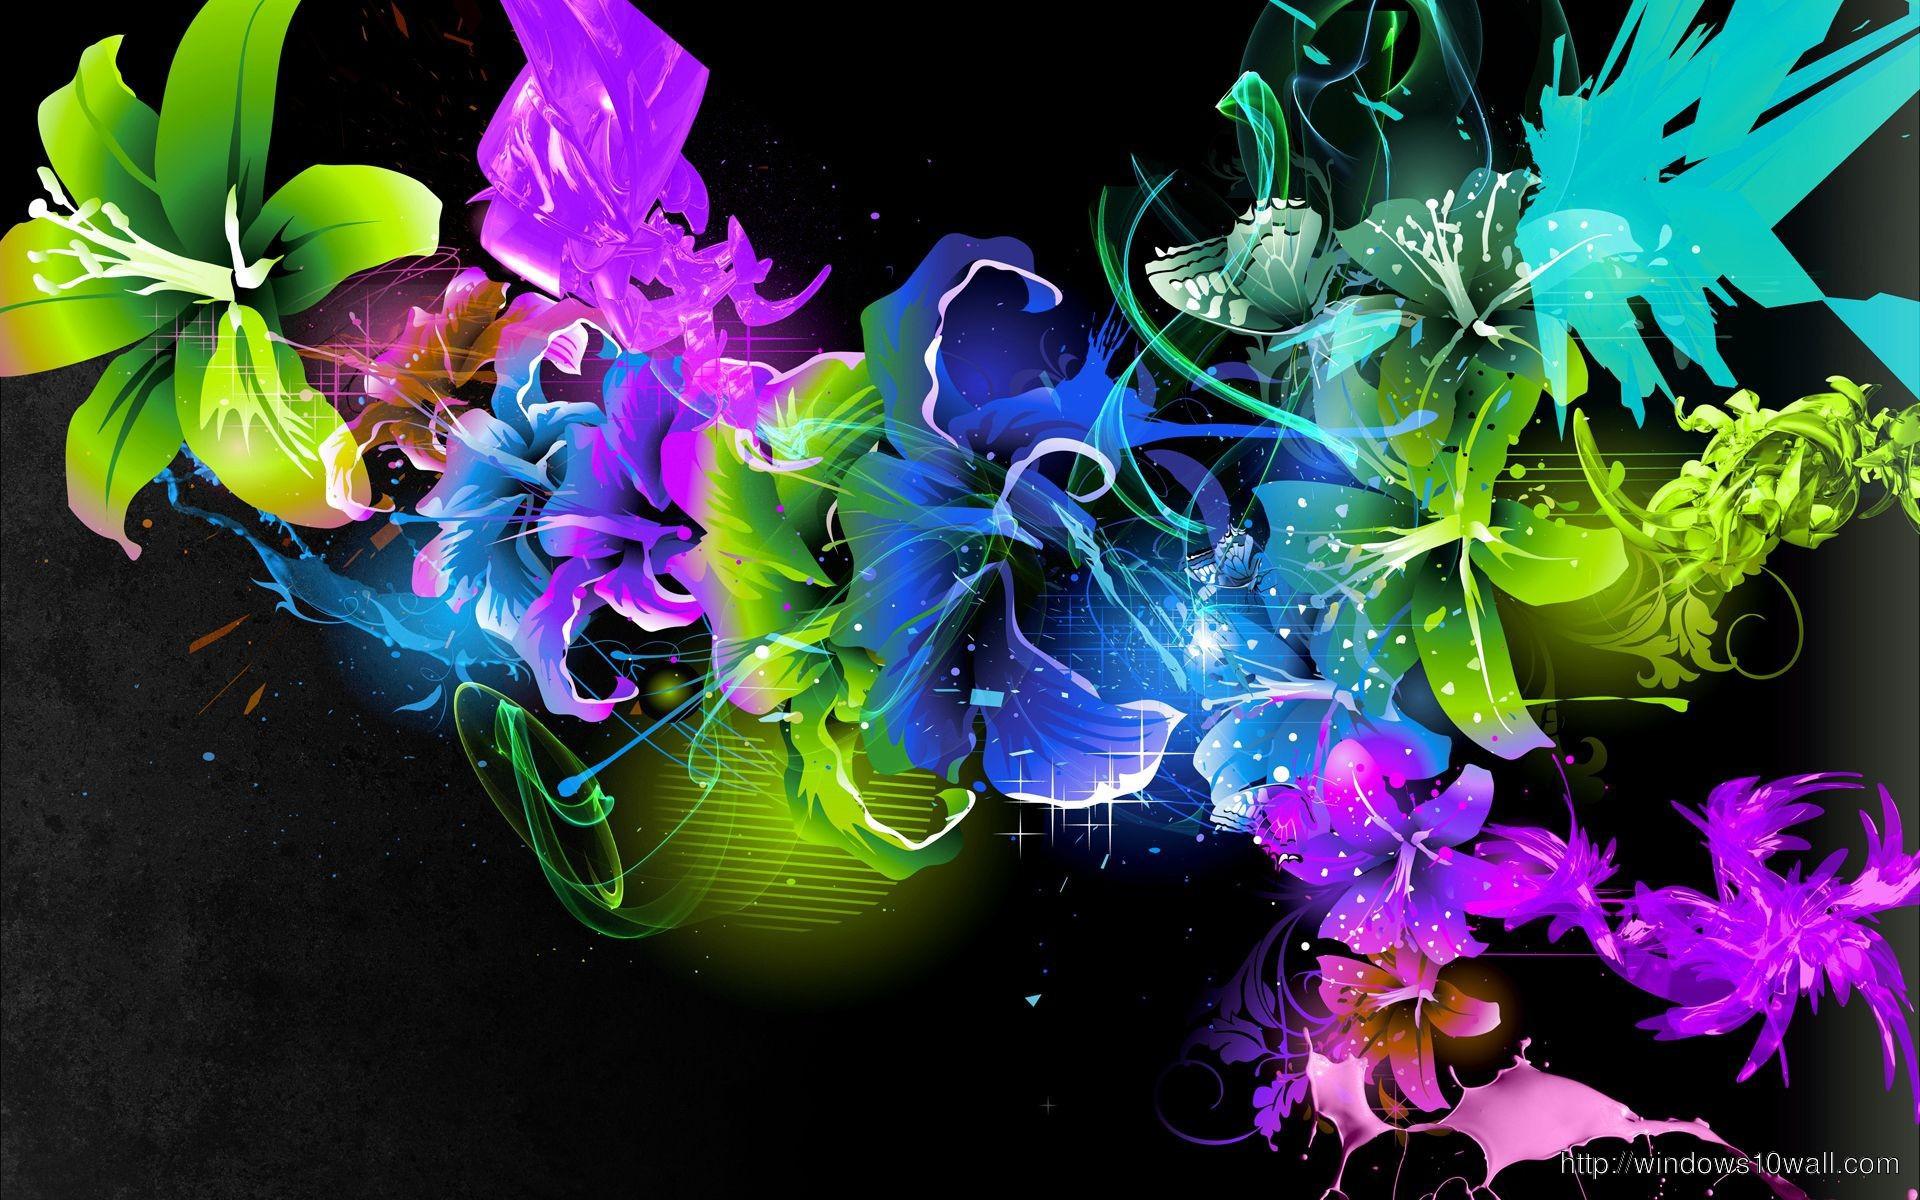 Abstract Wallpaper Hd 1080p Windows 10 Wallpapers